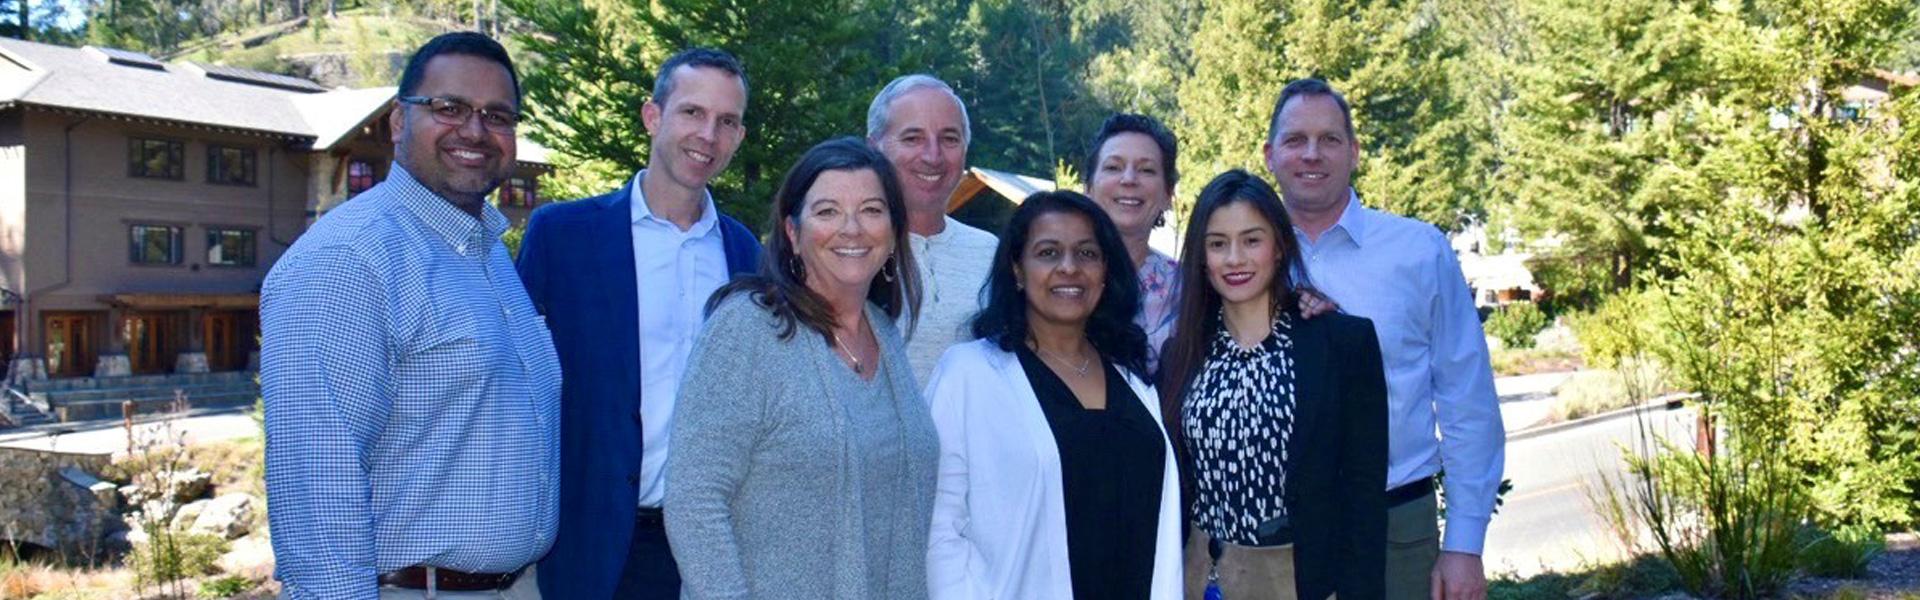 The 1440 Foundation Team